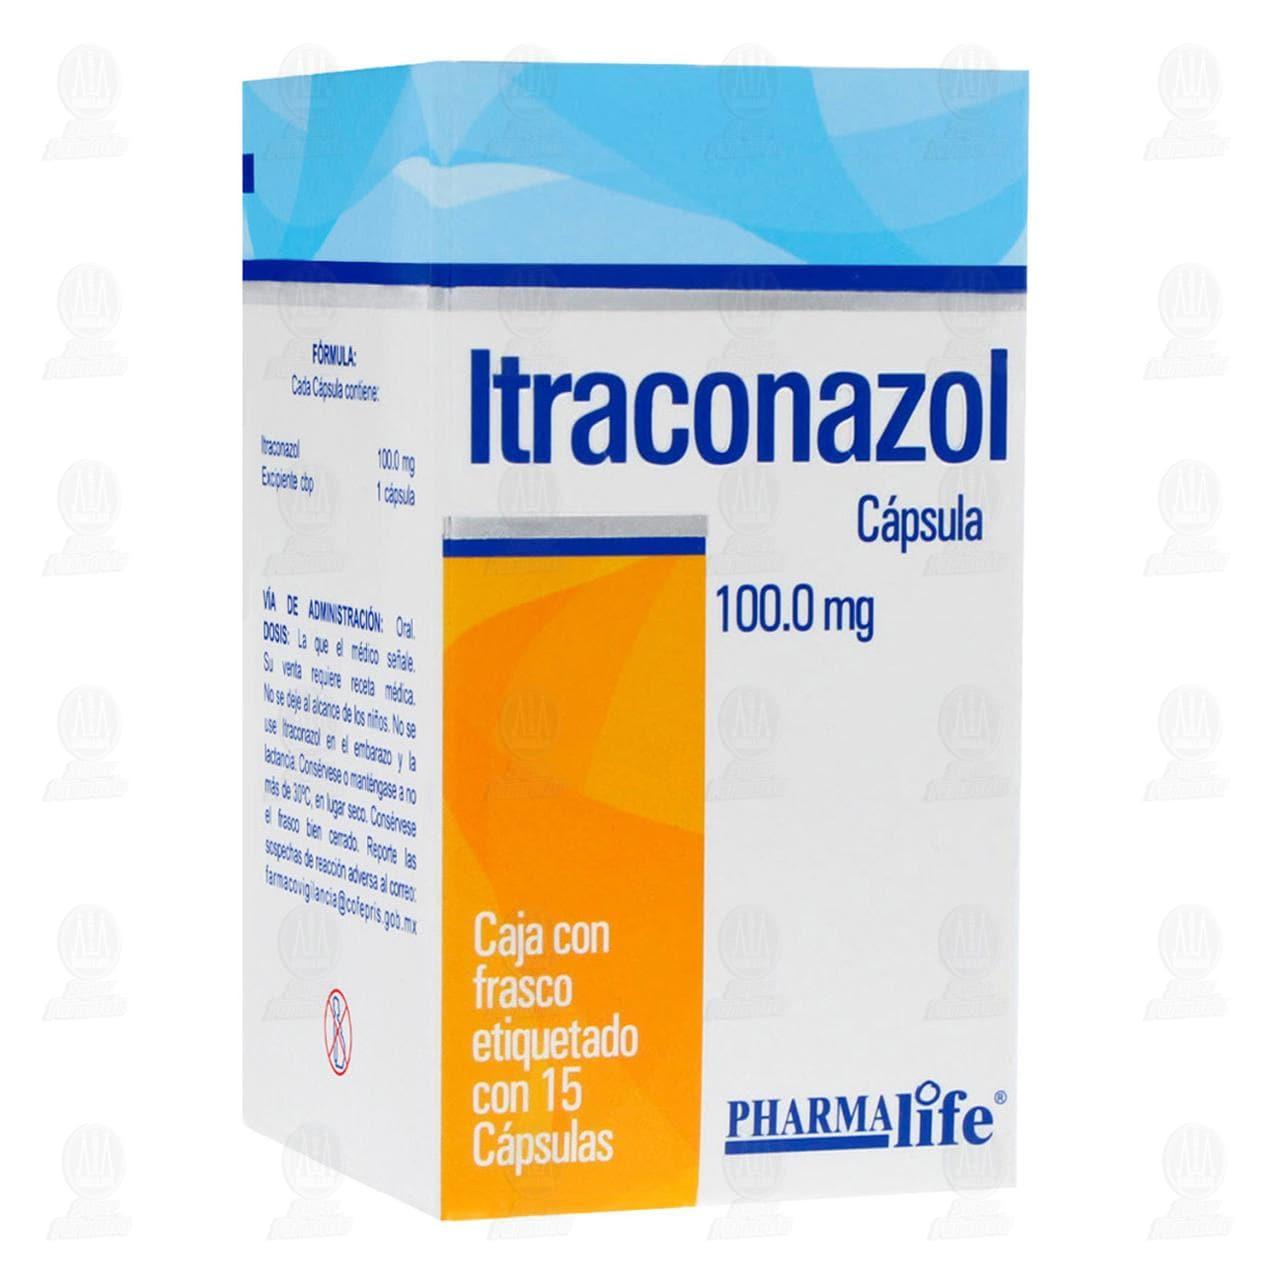 Comprar Itraconazol 100mg 15 Cápsulas Pharmalife en Farmacias Guadalajara